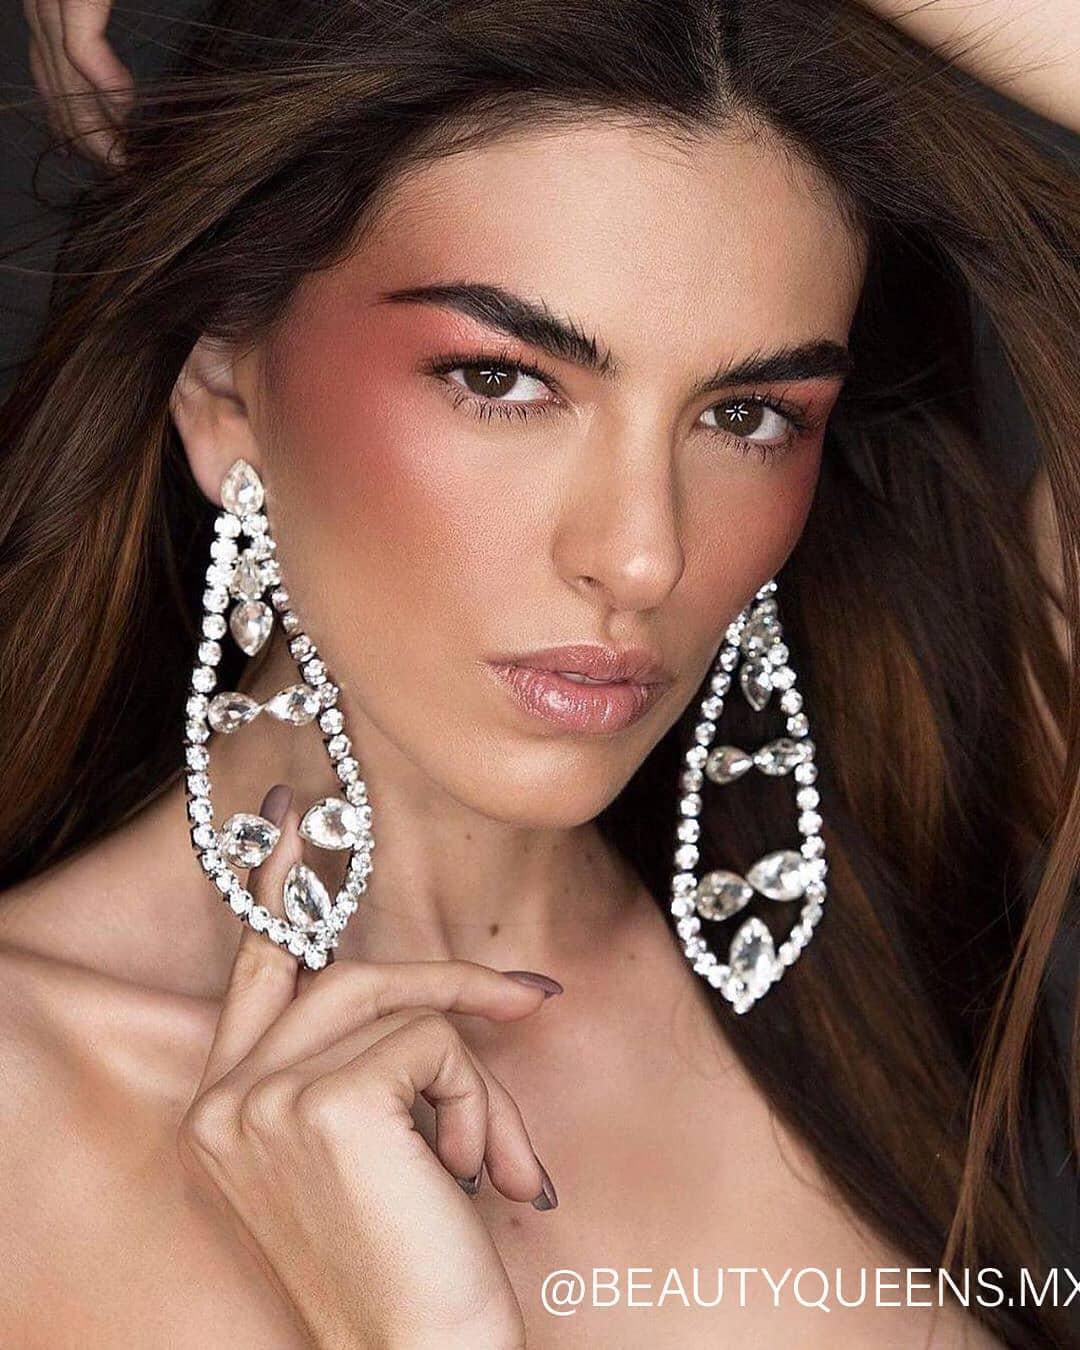 elizabeth de alba, top 15 de top model of the world 2019/2nd runner-up de miss grand mexico 2020. - Página 4 83199110